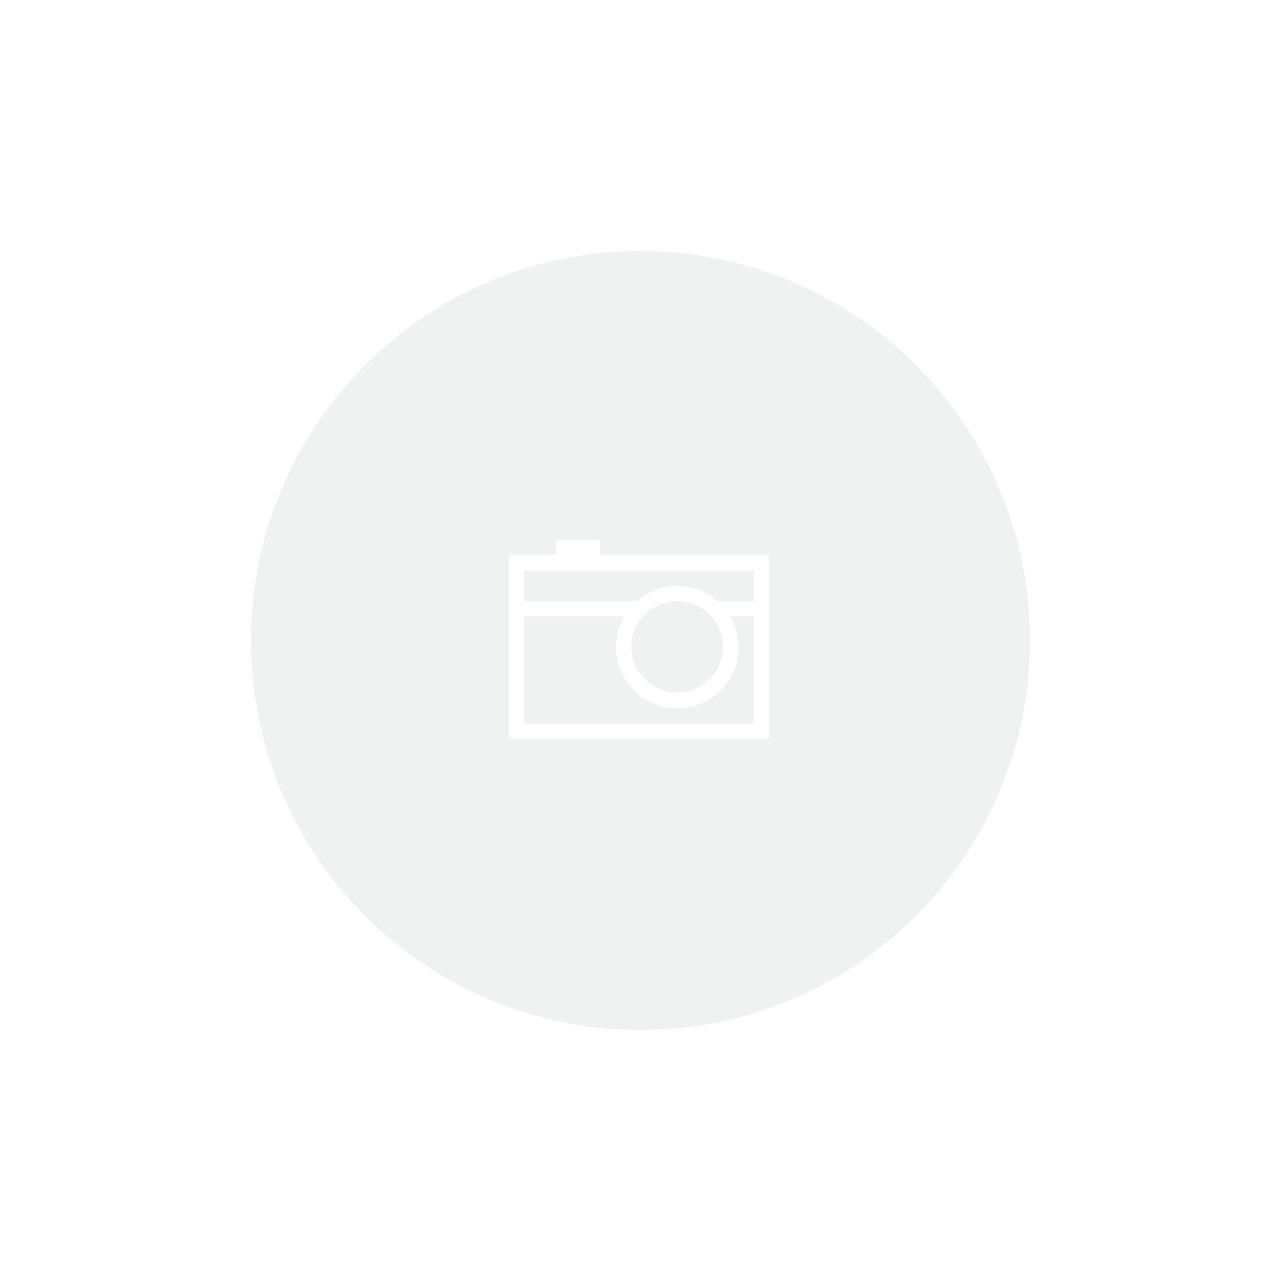 Conjunto de Talheres 24 Peças Ipanema Branco Tramontina